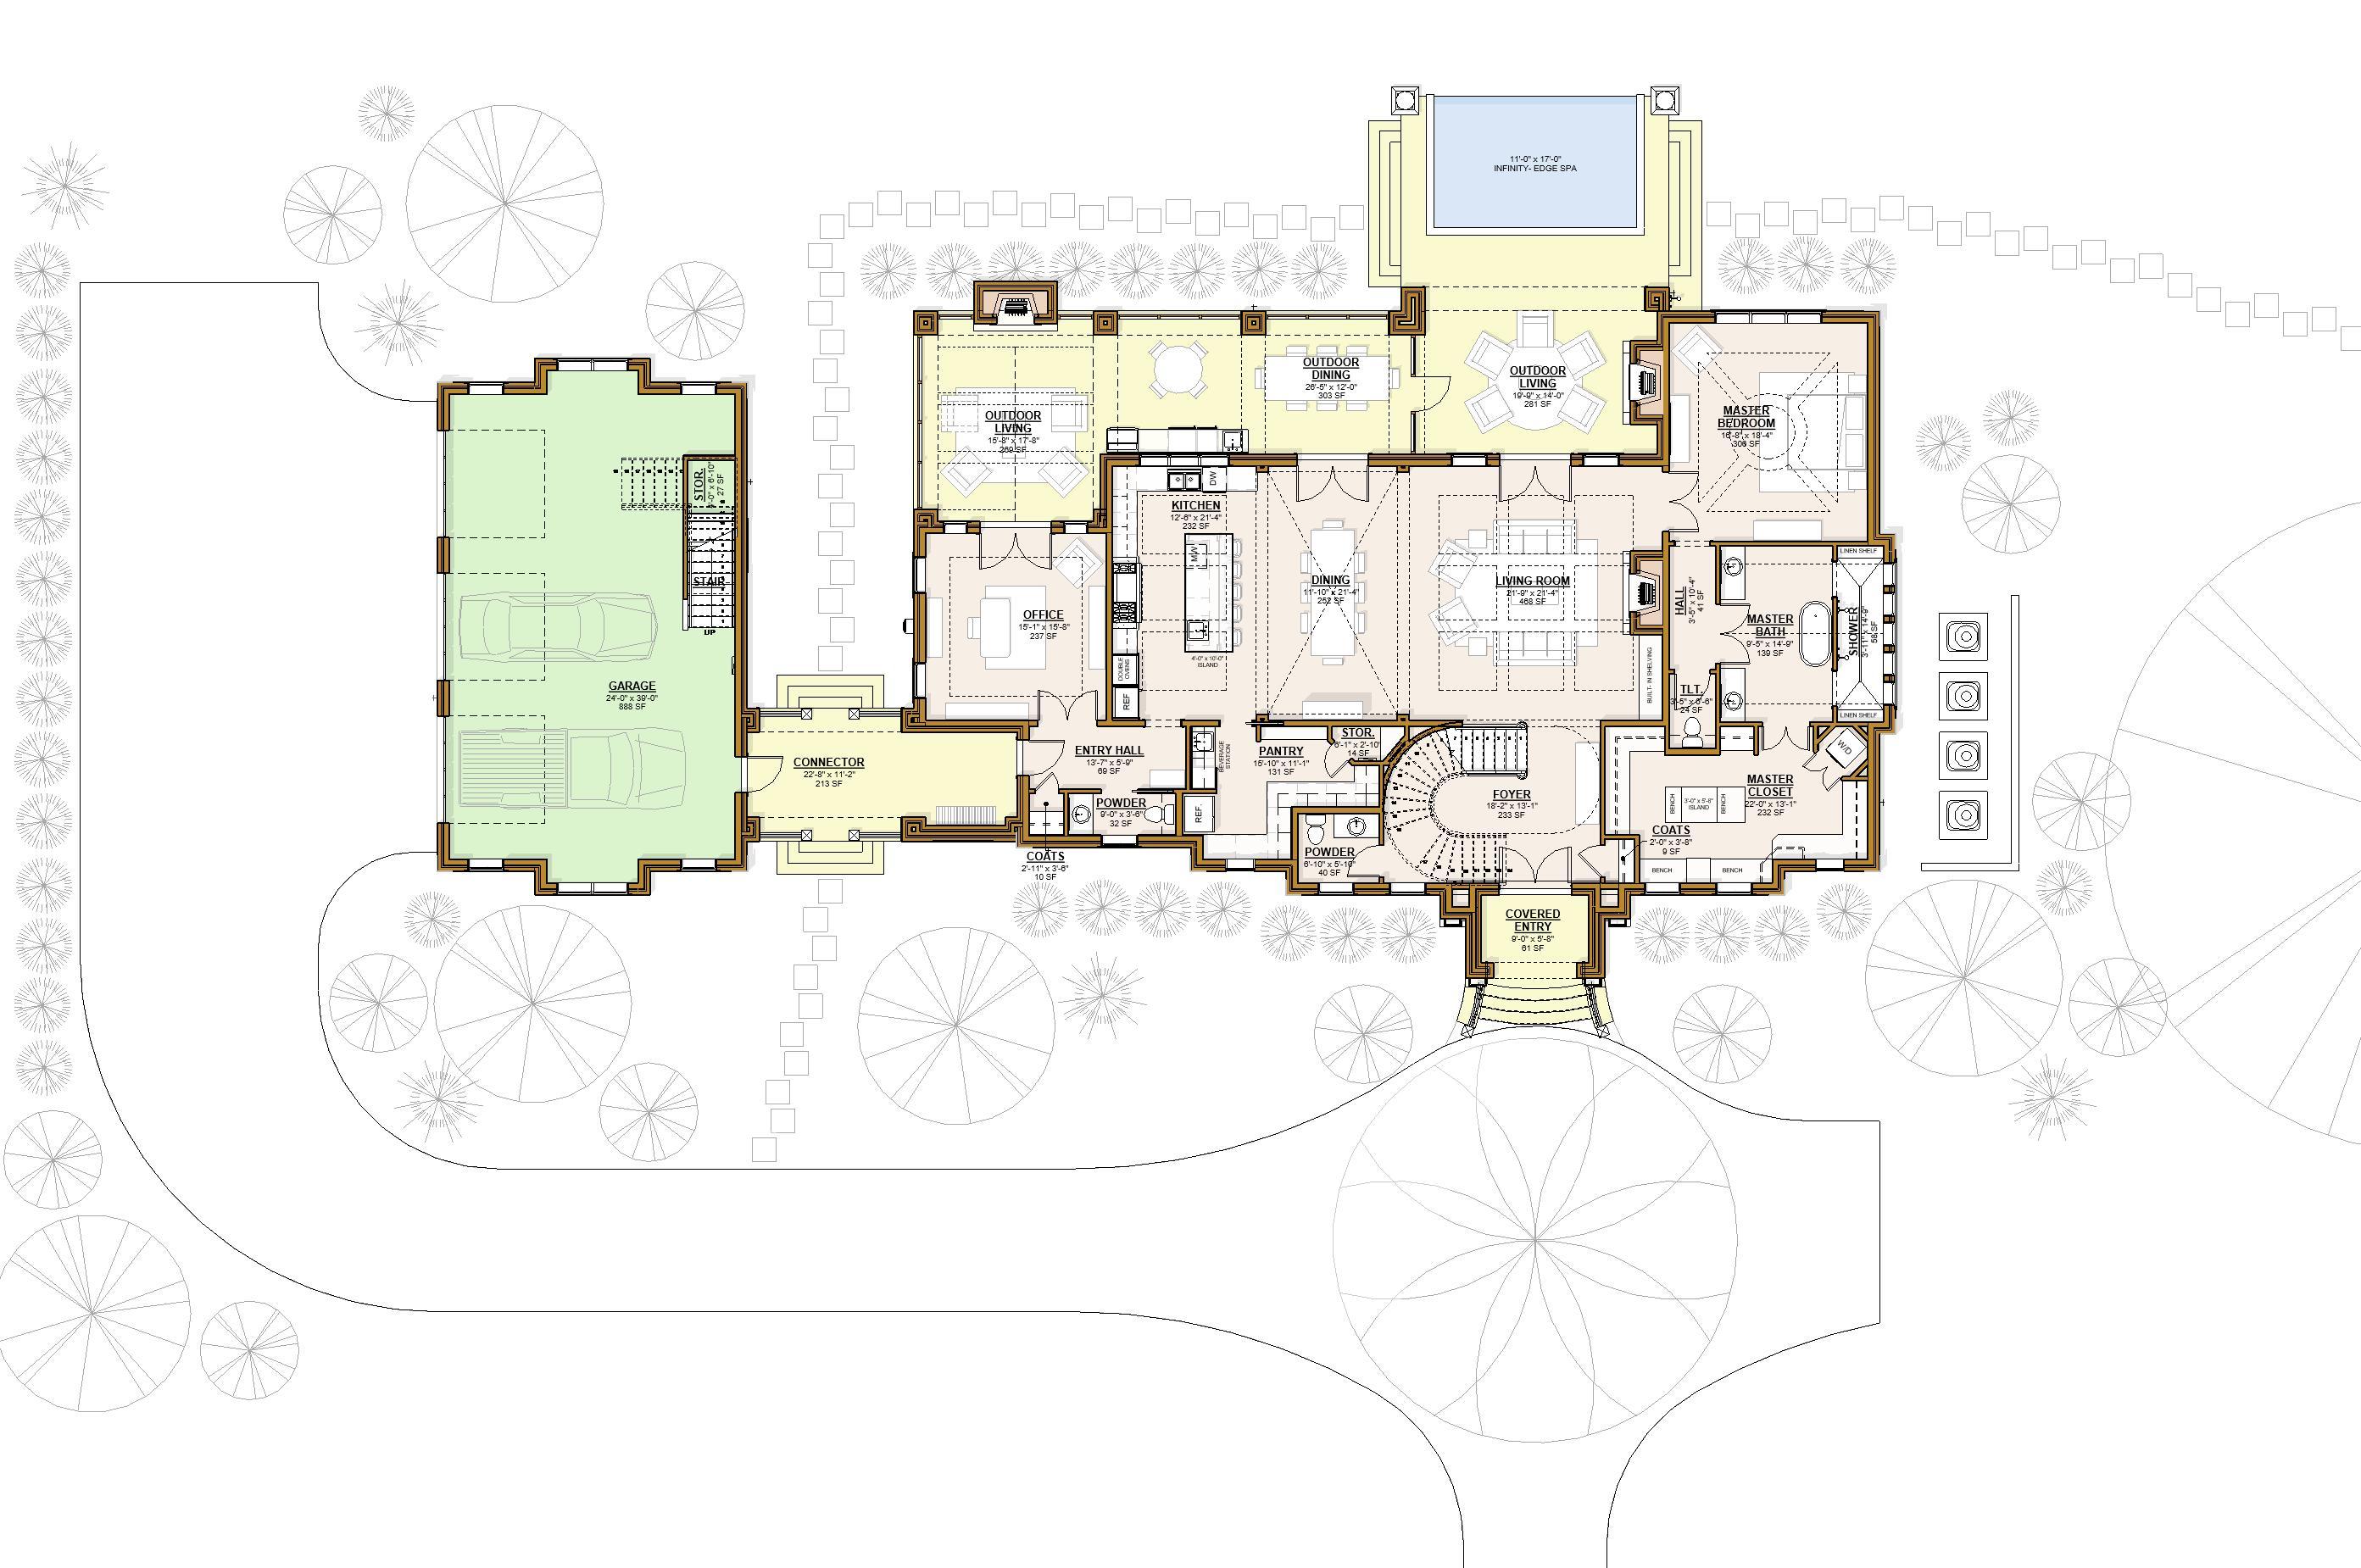 2027_Floor Plan - Level 1 - Pres